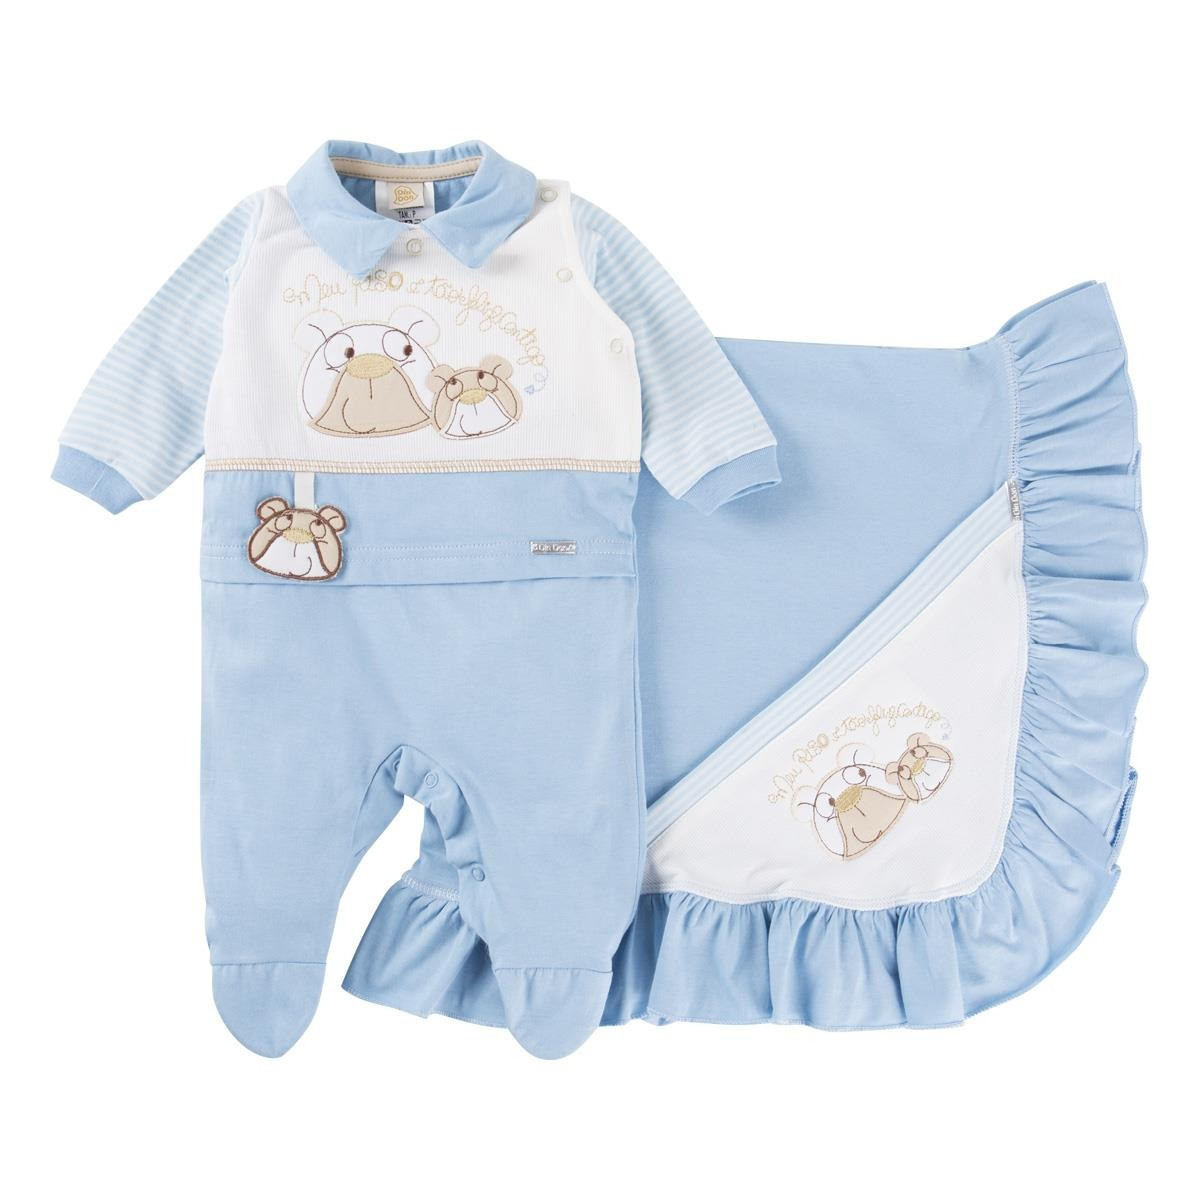 0bbb6fbdd1 kit saída maternidade menino bebe marca din don frete grátis. Carregando  zoom.